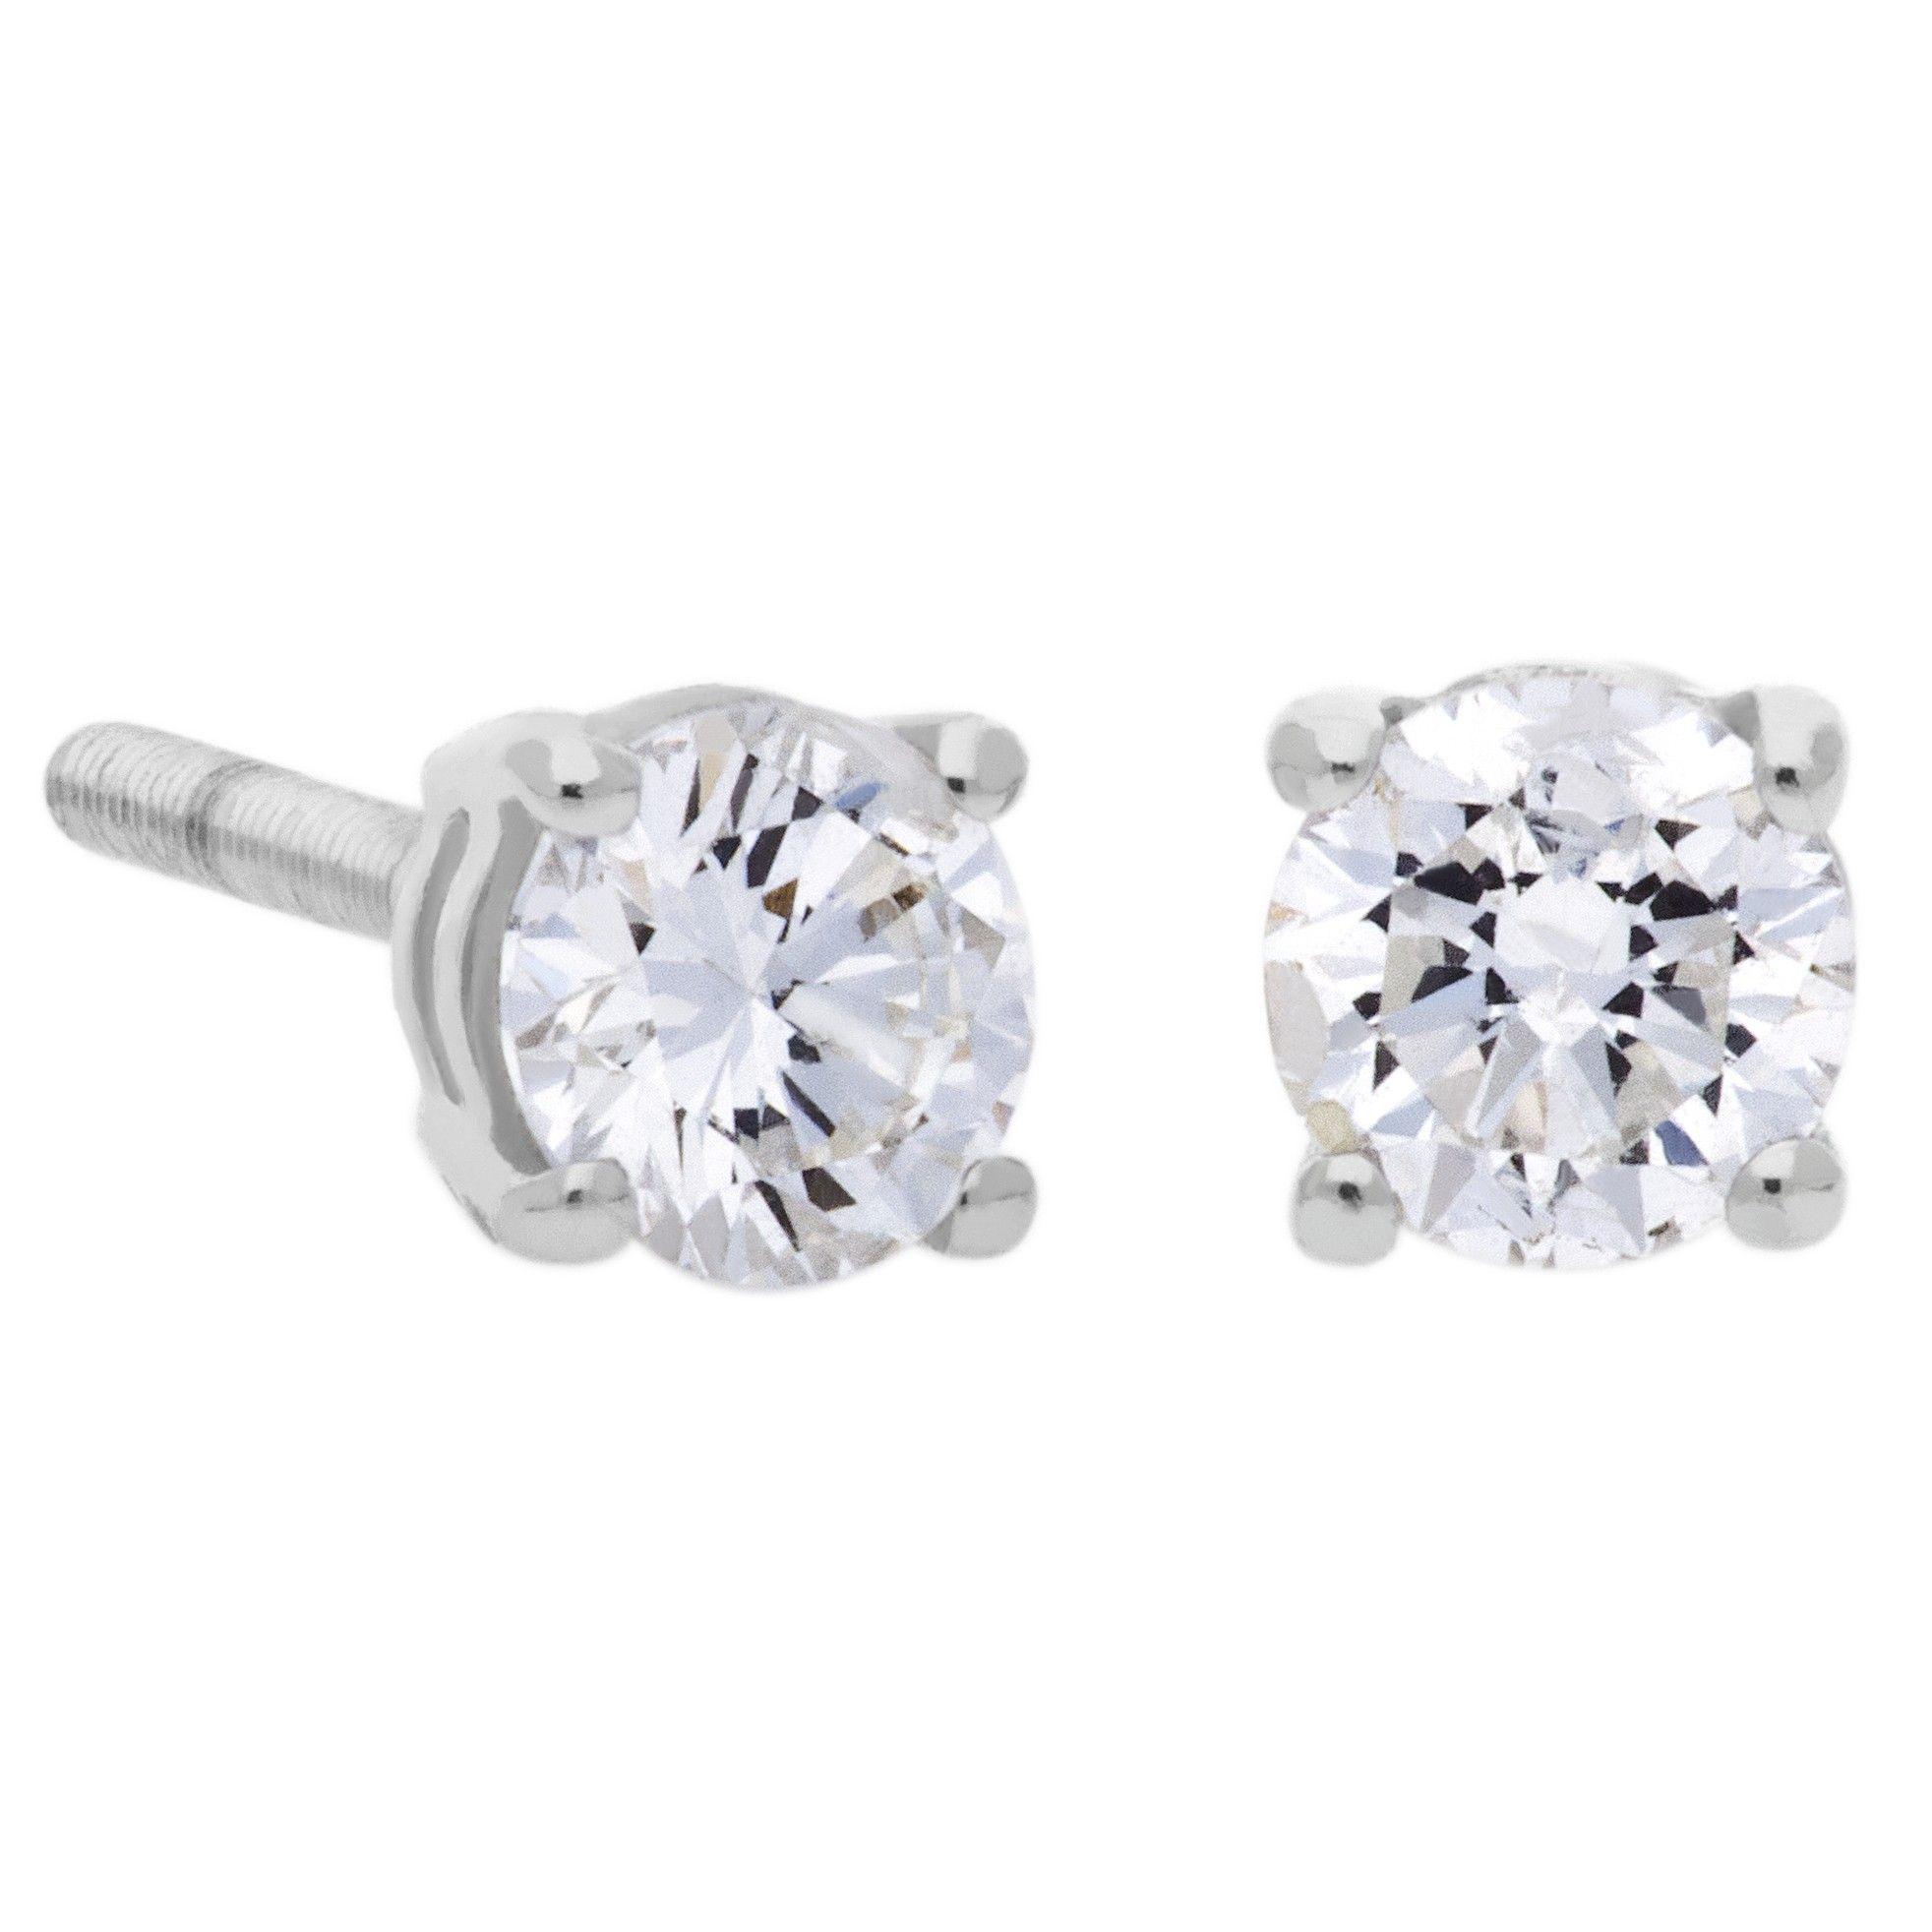 fd3f2ca493f55 9ct White Gold 0.20ct Four Claw Diamond Earrings SKE2534-20 ...